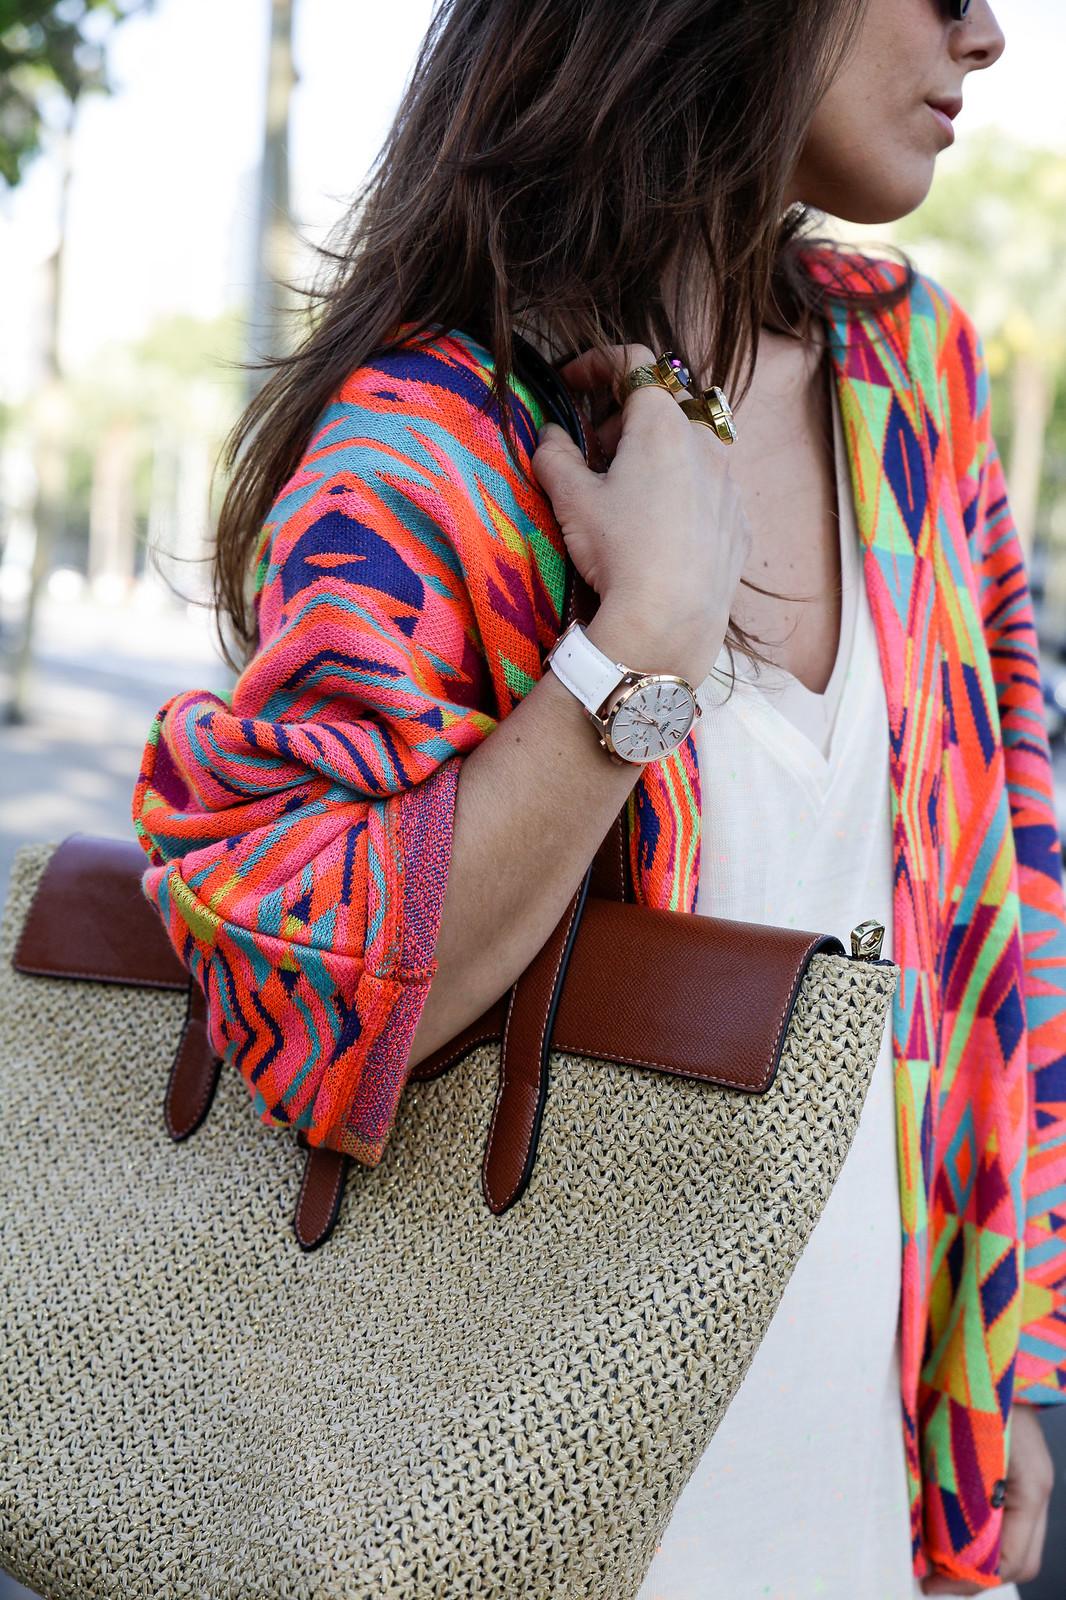 013_kimono_look_street_style_barcelona_theguestgirl_pepe_moll_ruga_caroline_svedbom_kapten_son